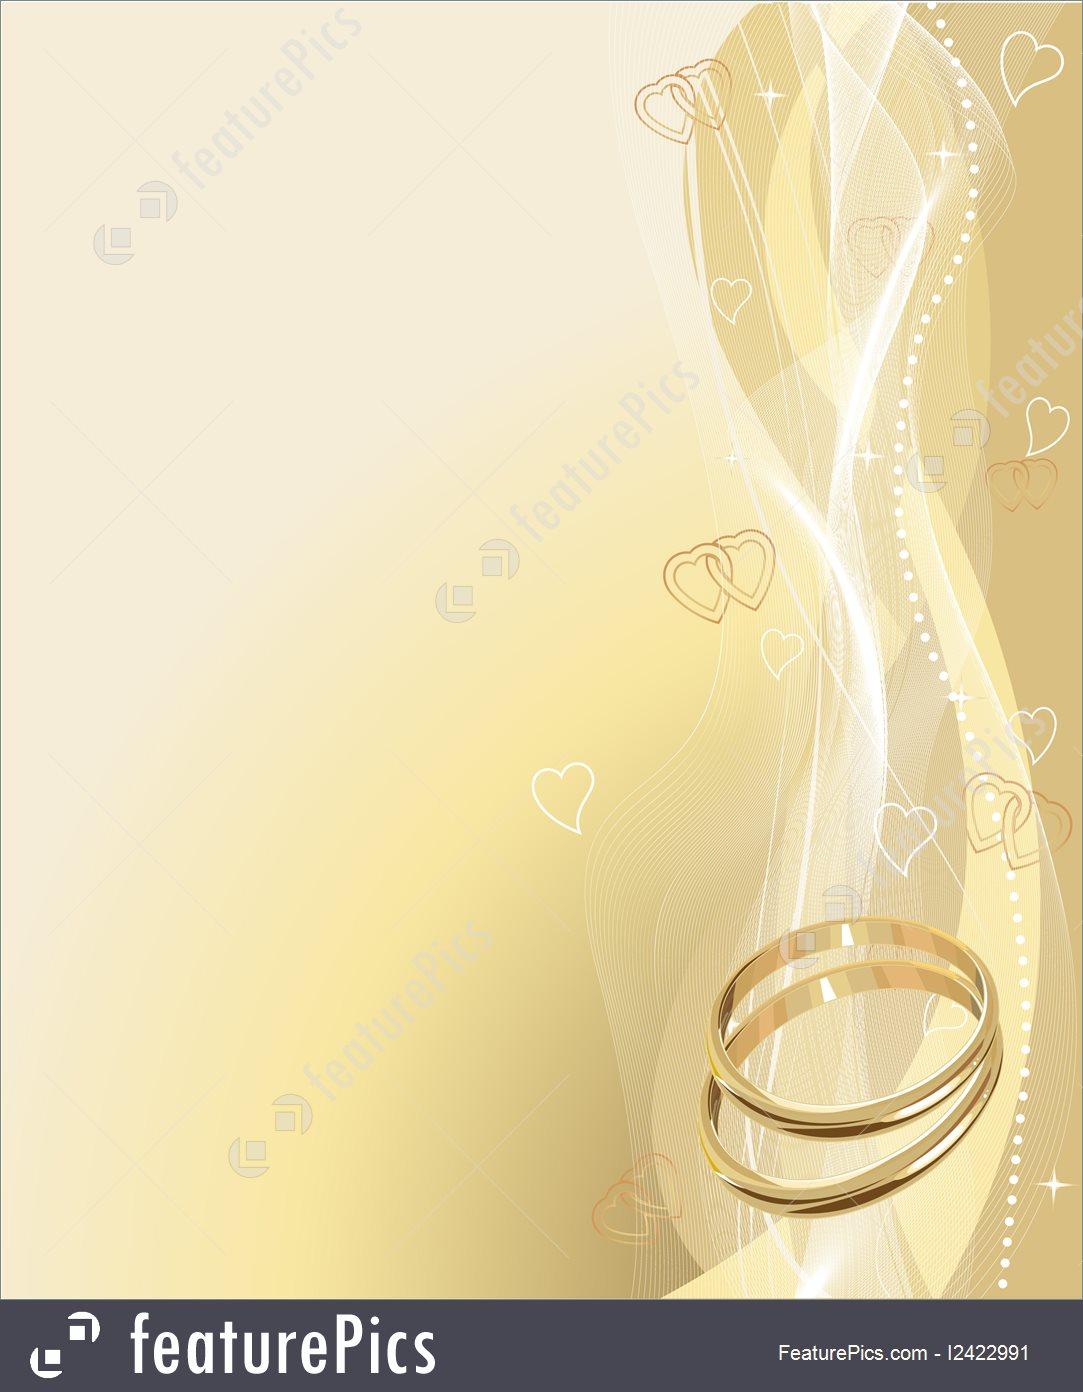 Beautiful Wedding Rings Background 1083x1392